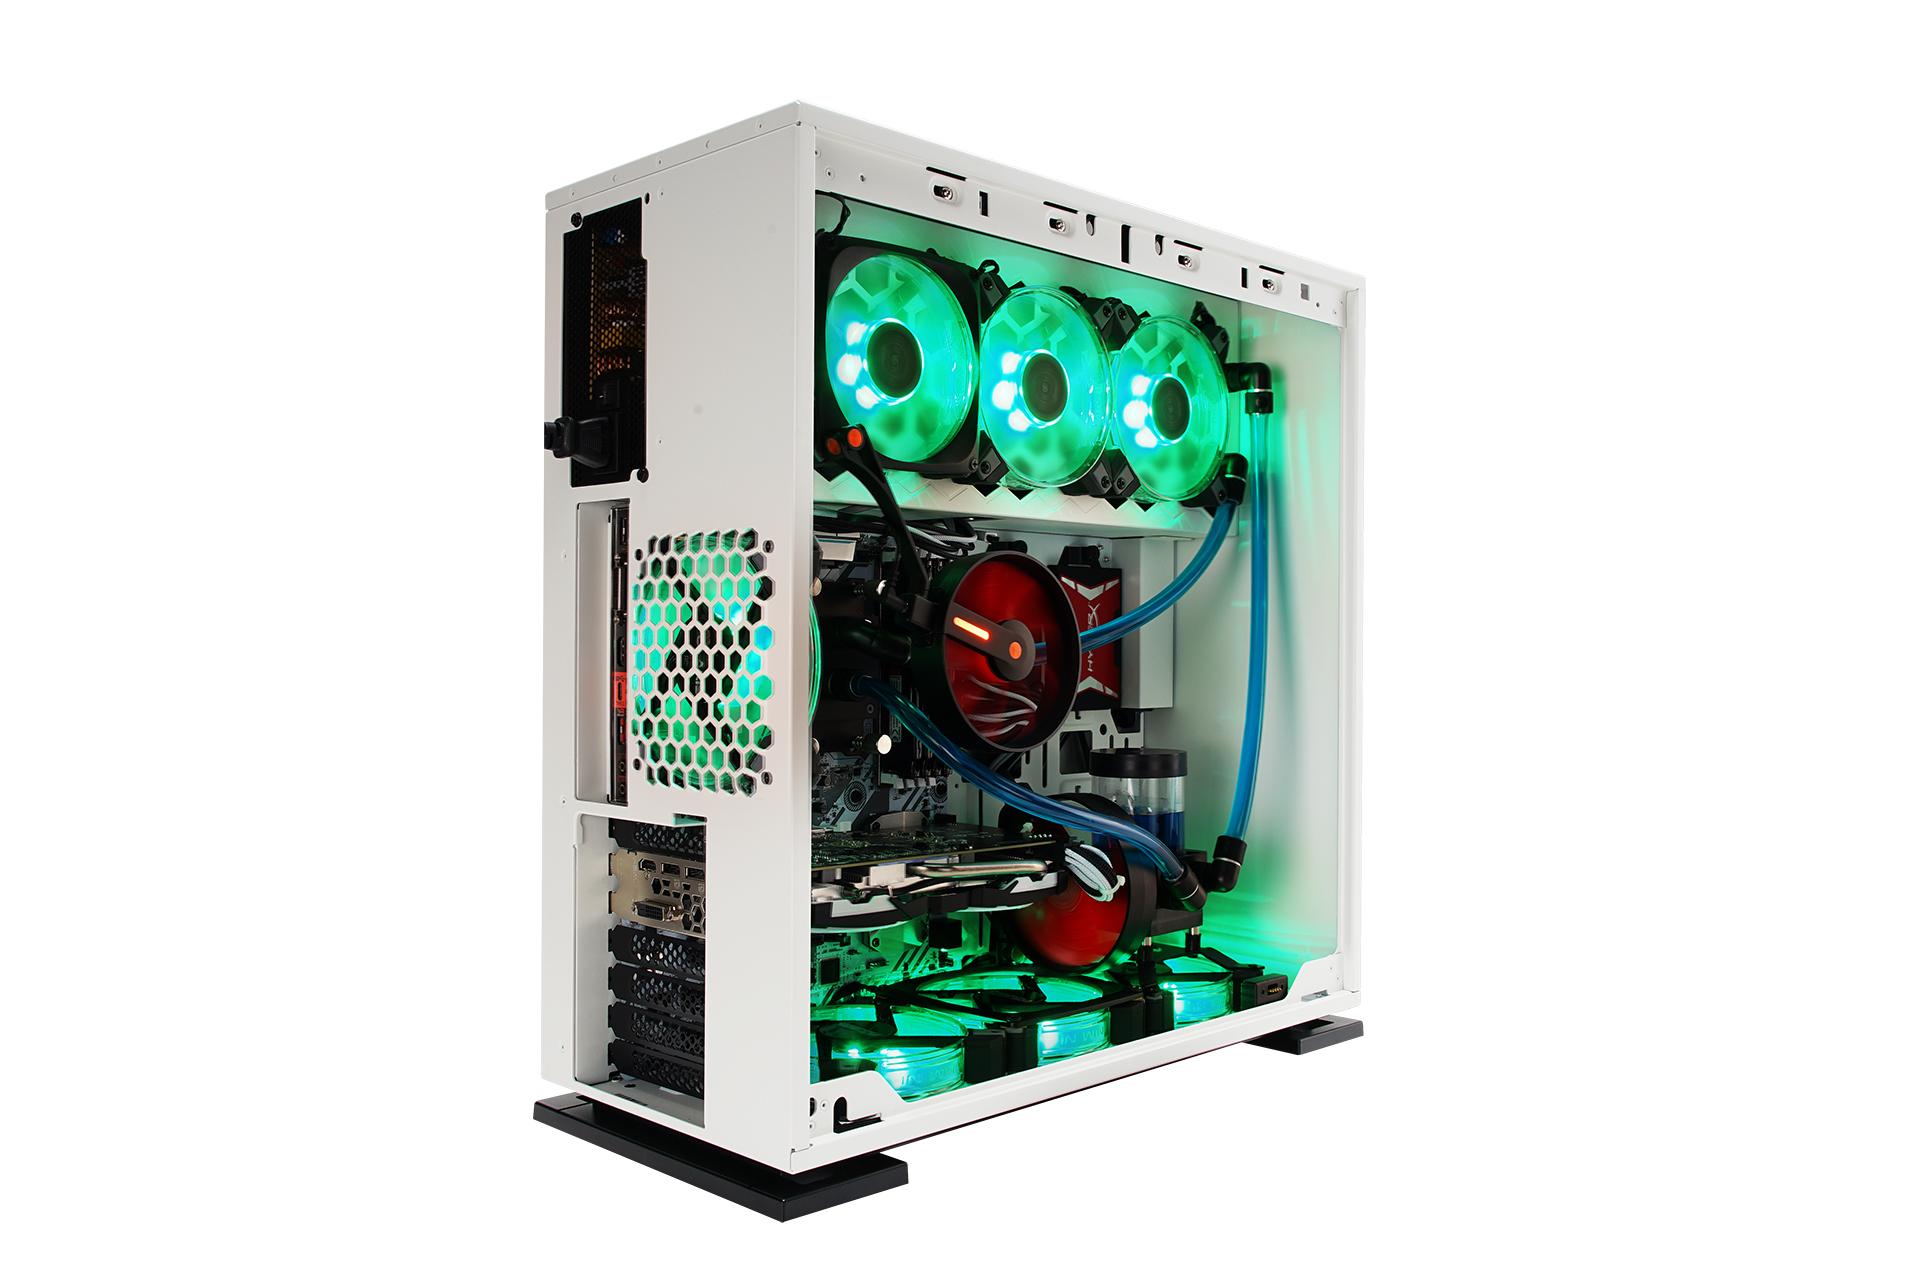 new_web/1506003451575-303MSI_white_19.jpg